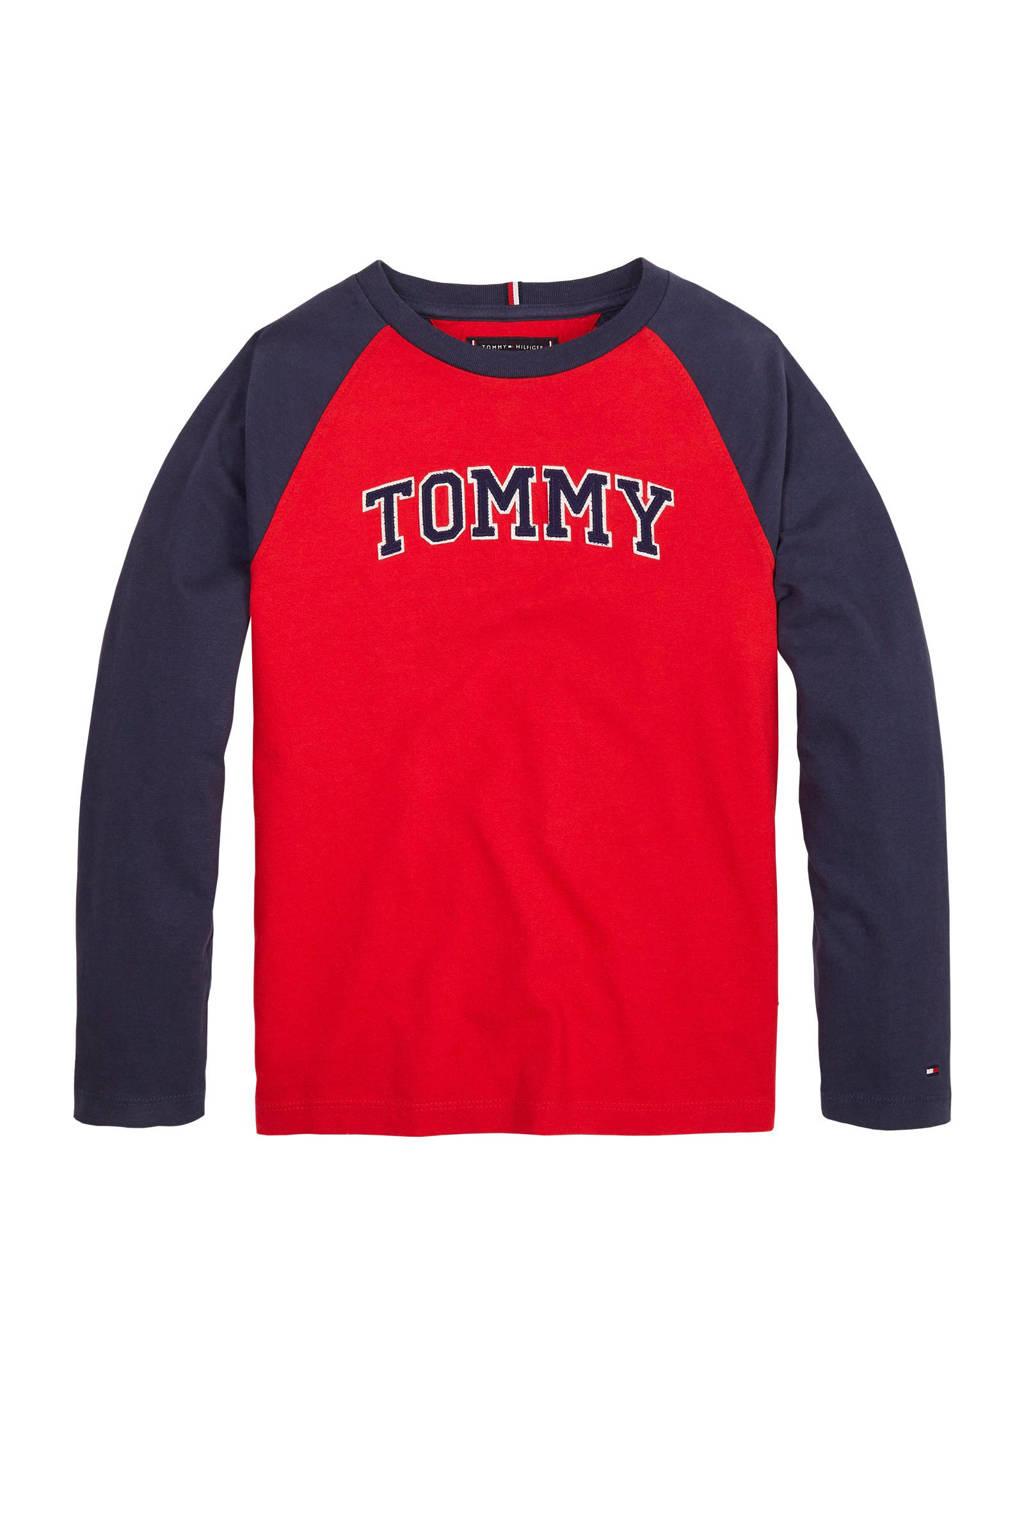 Tommy Hilfiger longsleeve met logo rood/donkerblauw, Rood/donkerblauw